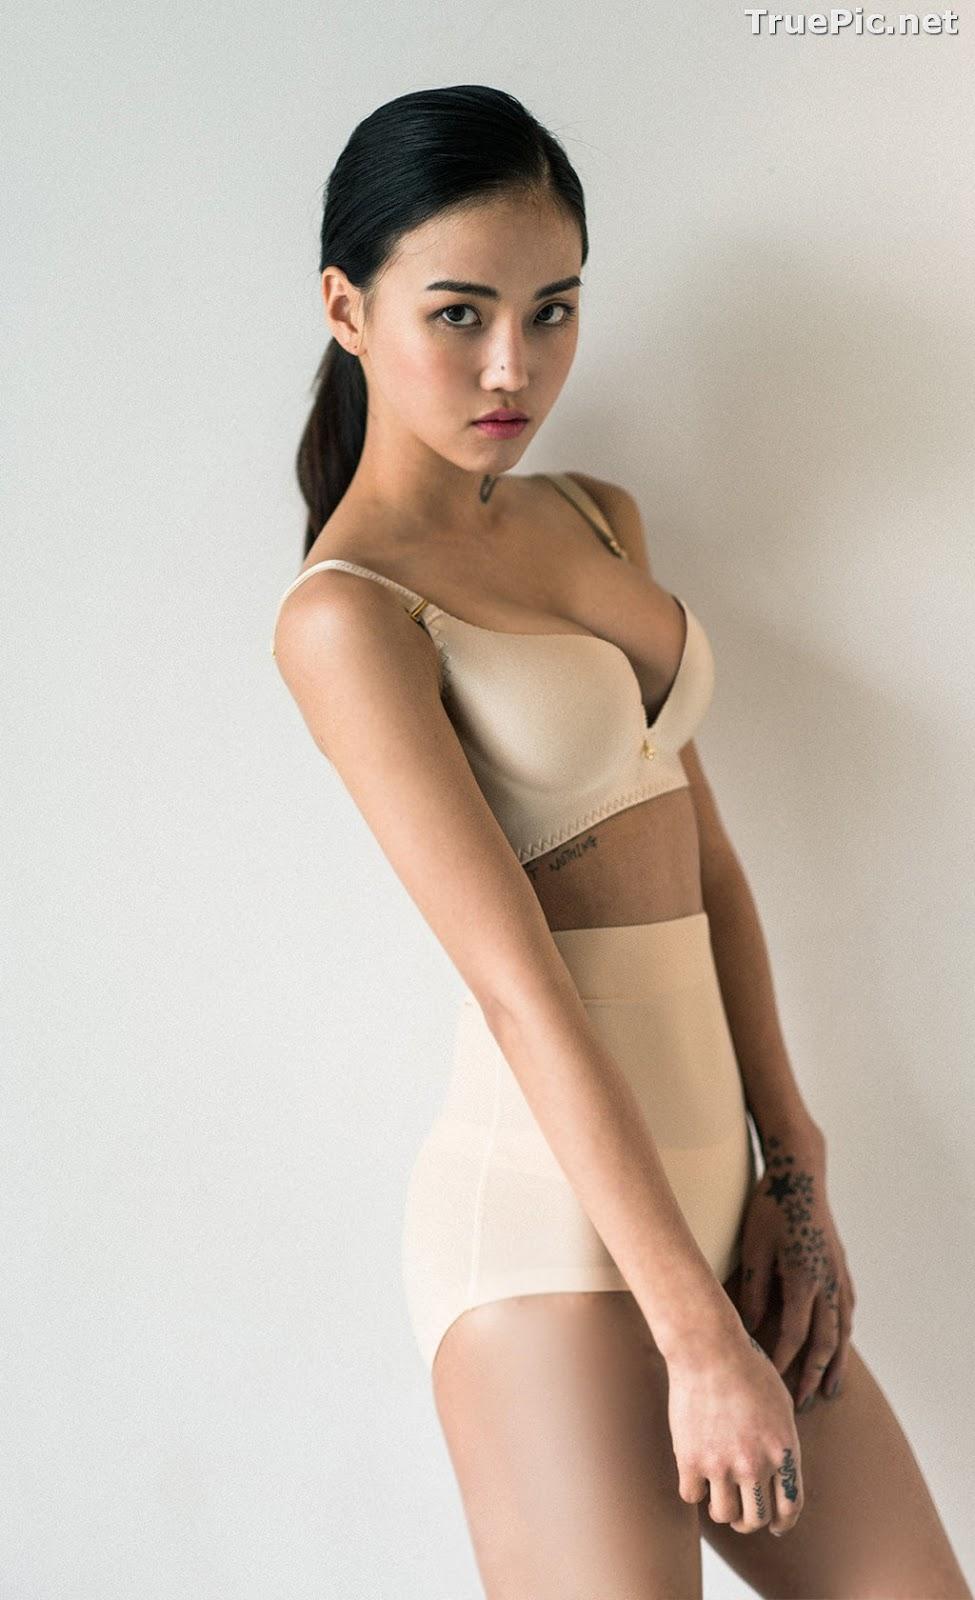 Image Korean Fashion Model – Baek Ye Jin – Sexy Lingerie Collection #5 - TruePic.net - Picture-5